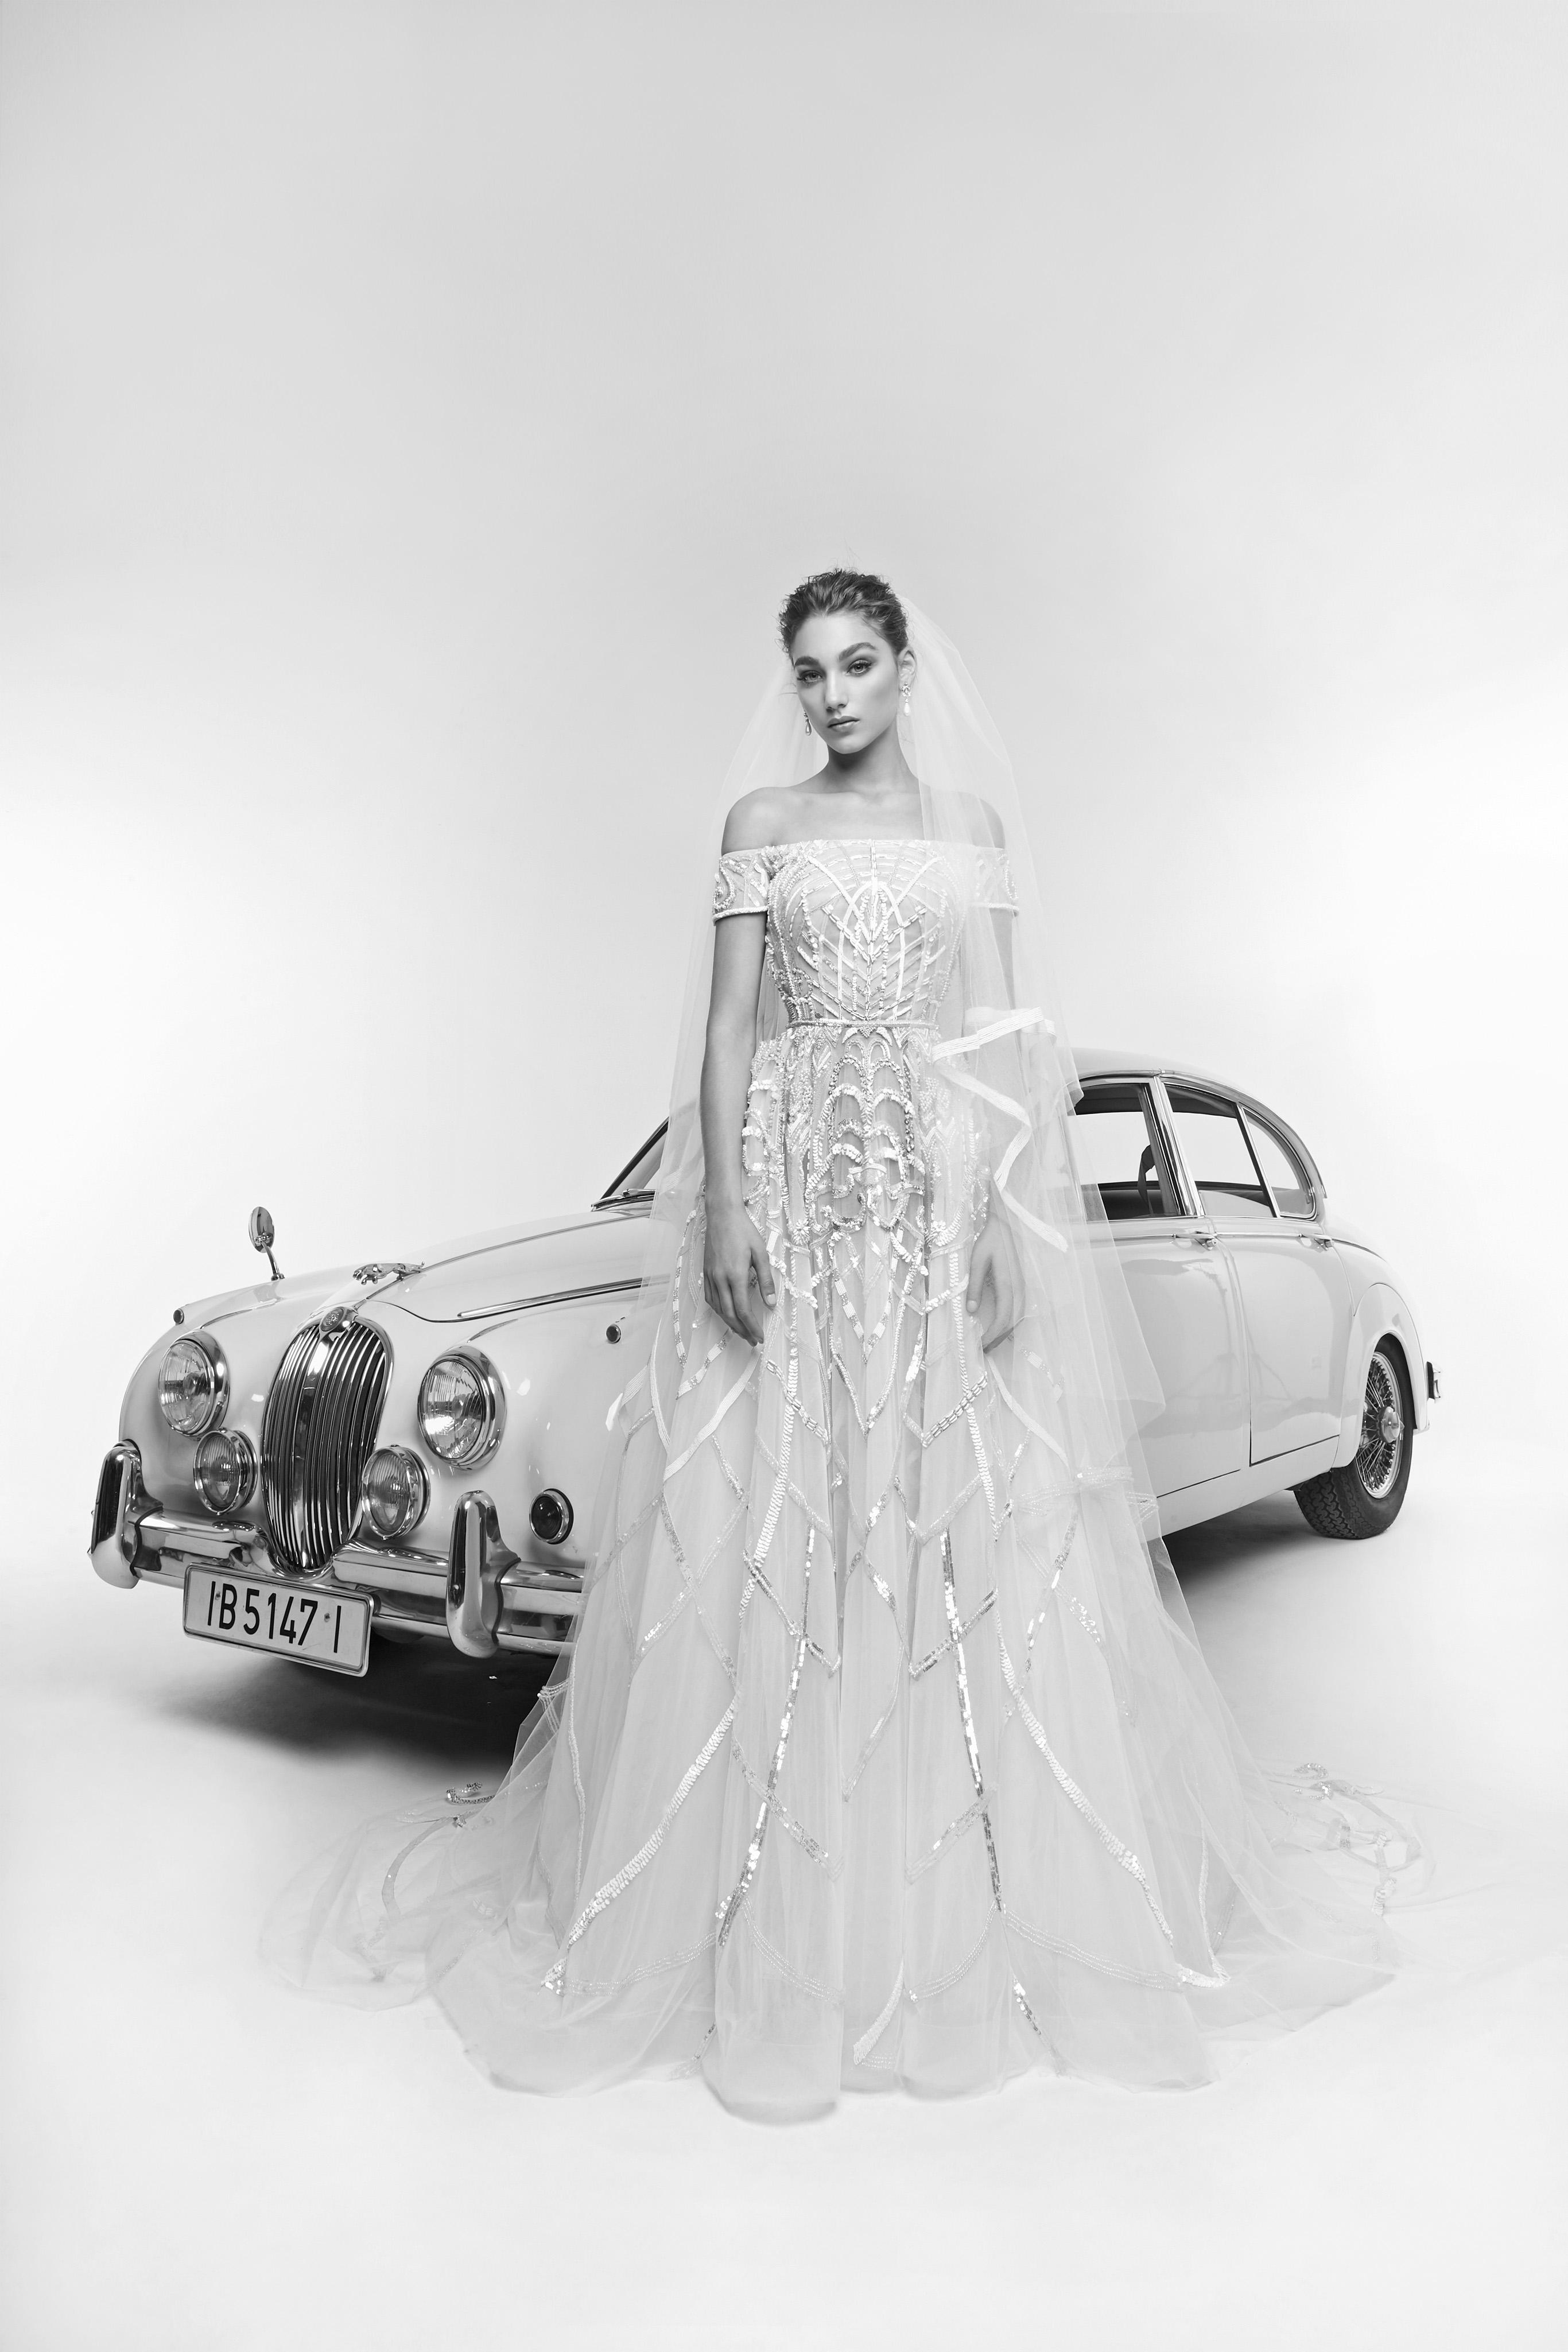 zuhair murad wedding dress spring 2019 off-the-shoulder ball gown with veil